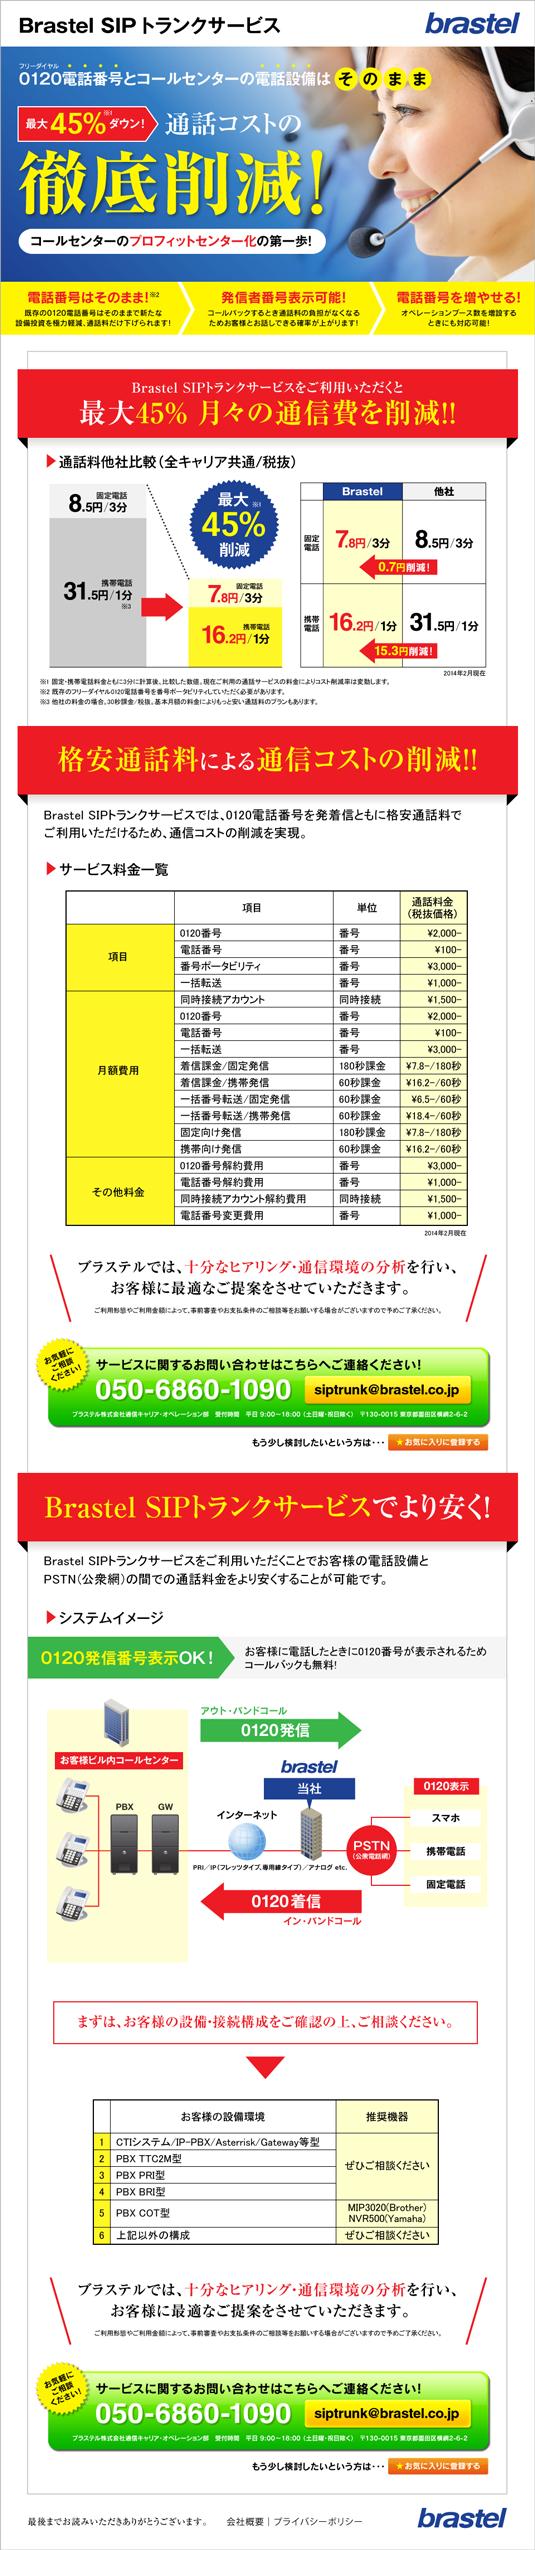 BRA_SIP_LA03BST140115